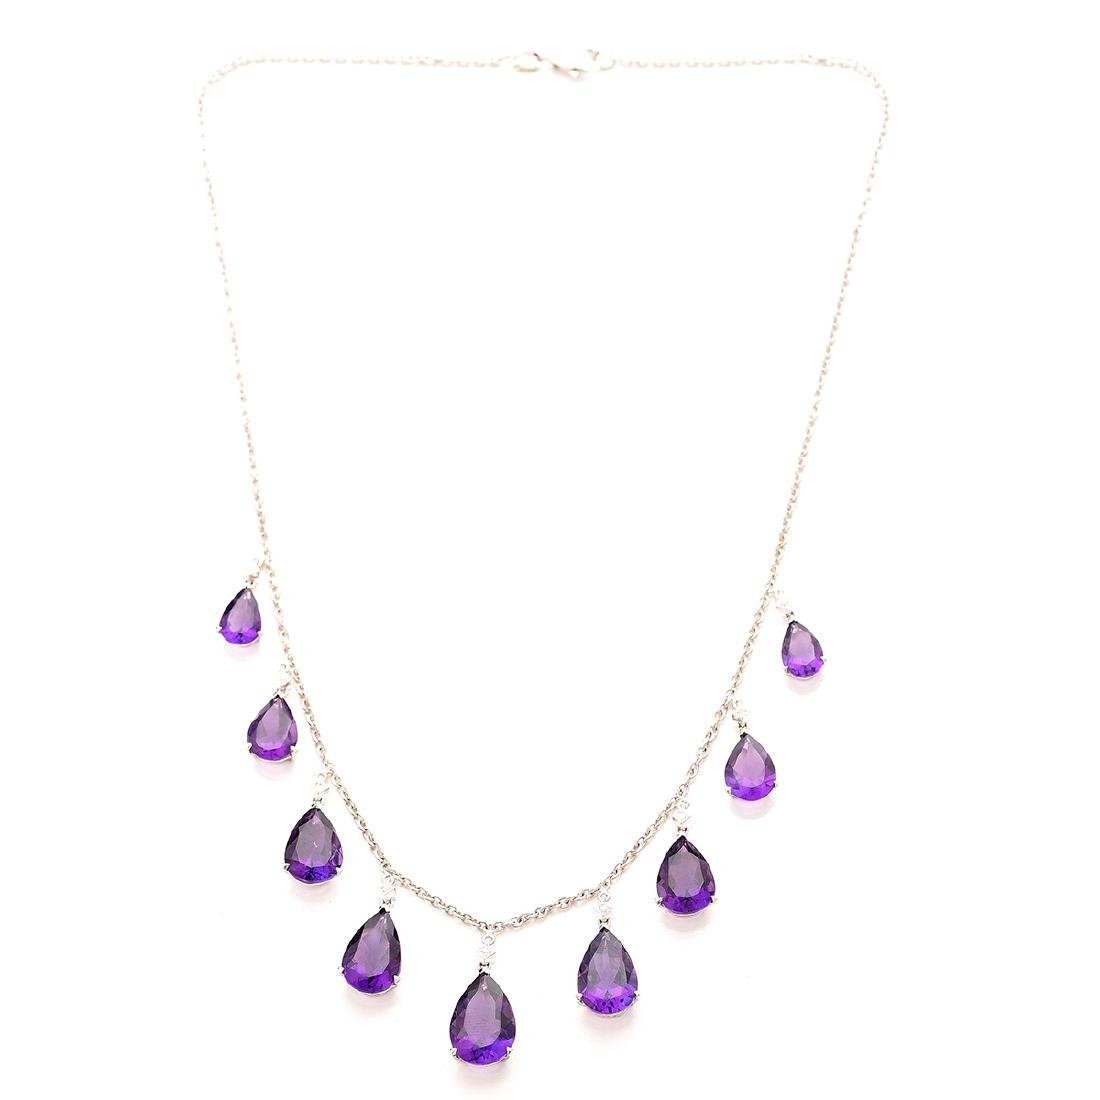 Amethyst, Diamond, 18k White Gold Necklace.